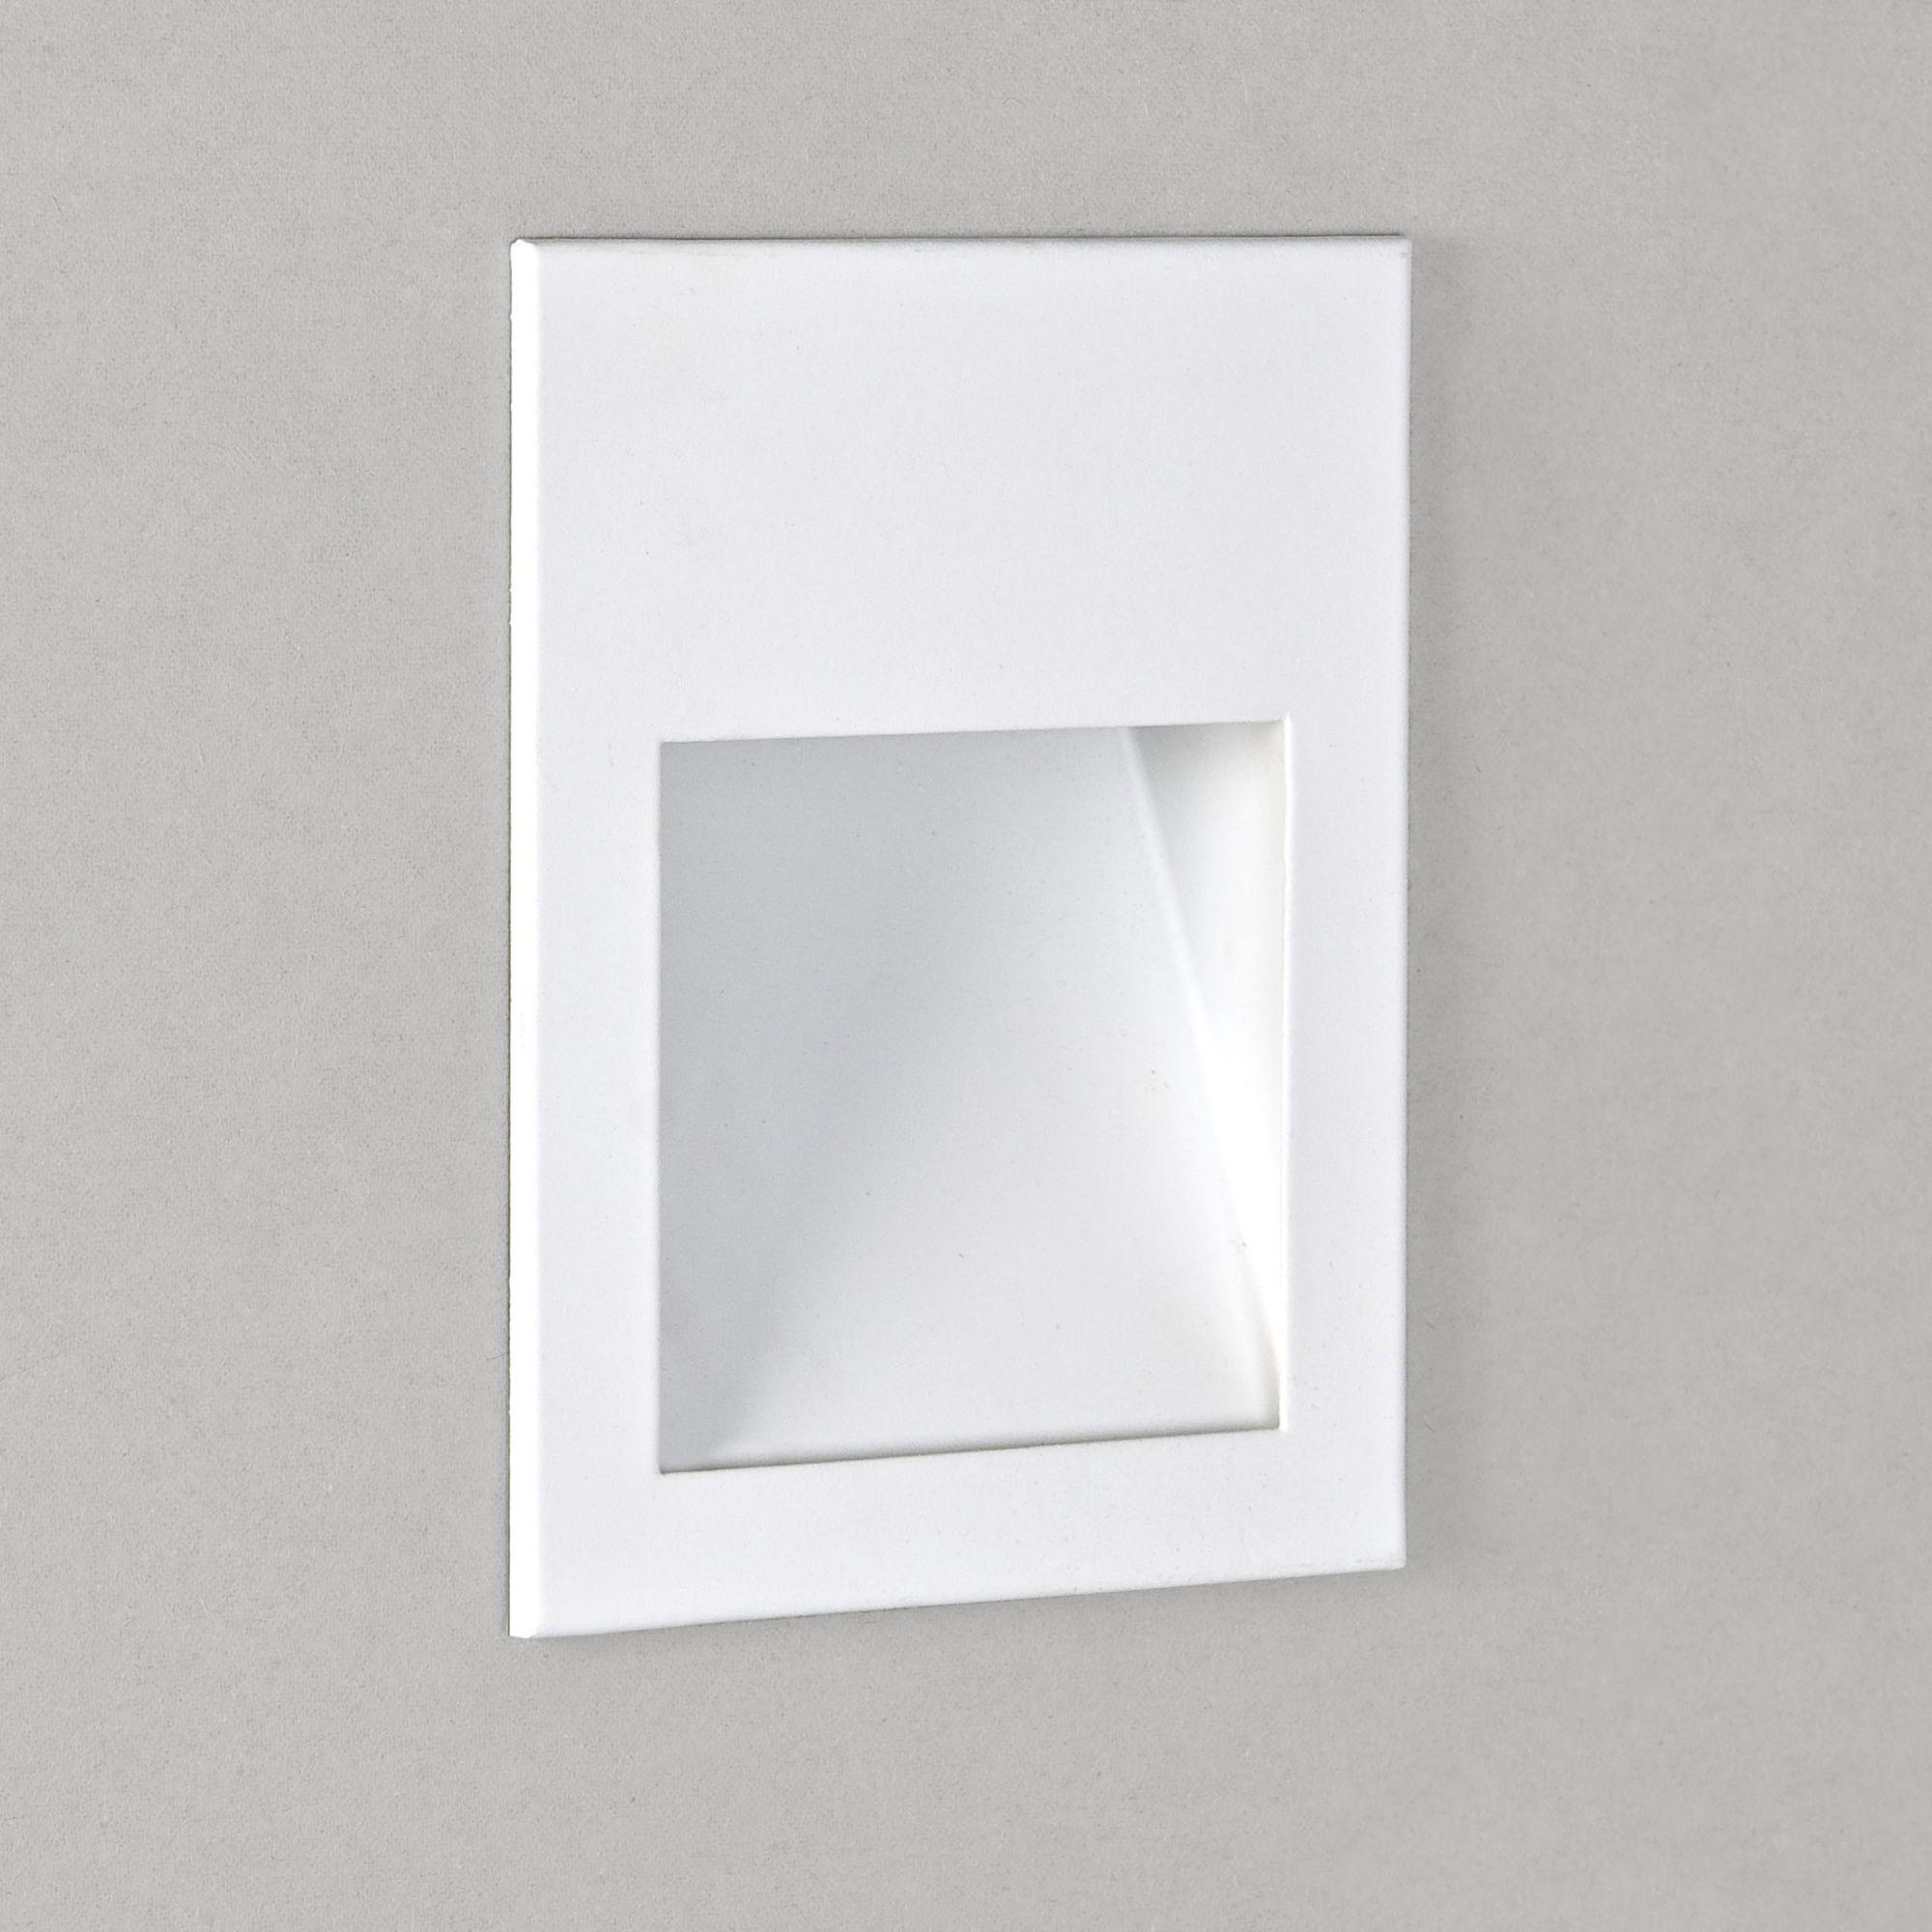 Lampa schodowa Borgo 90 LED 7530 Astro Lighting